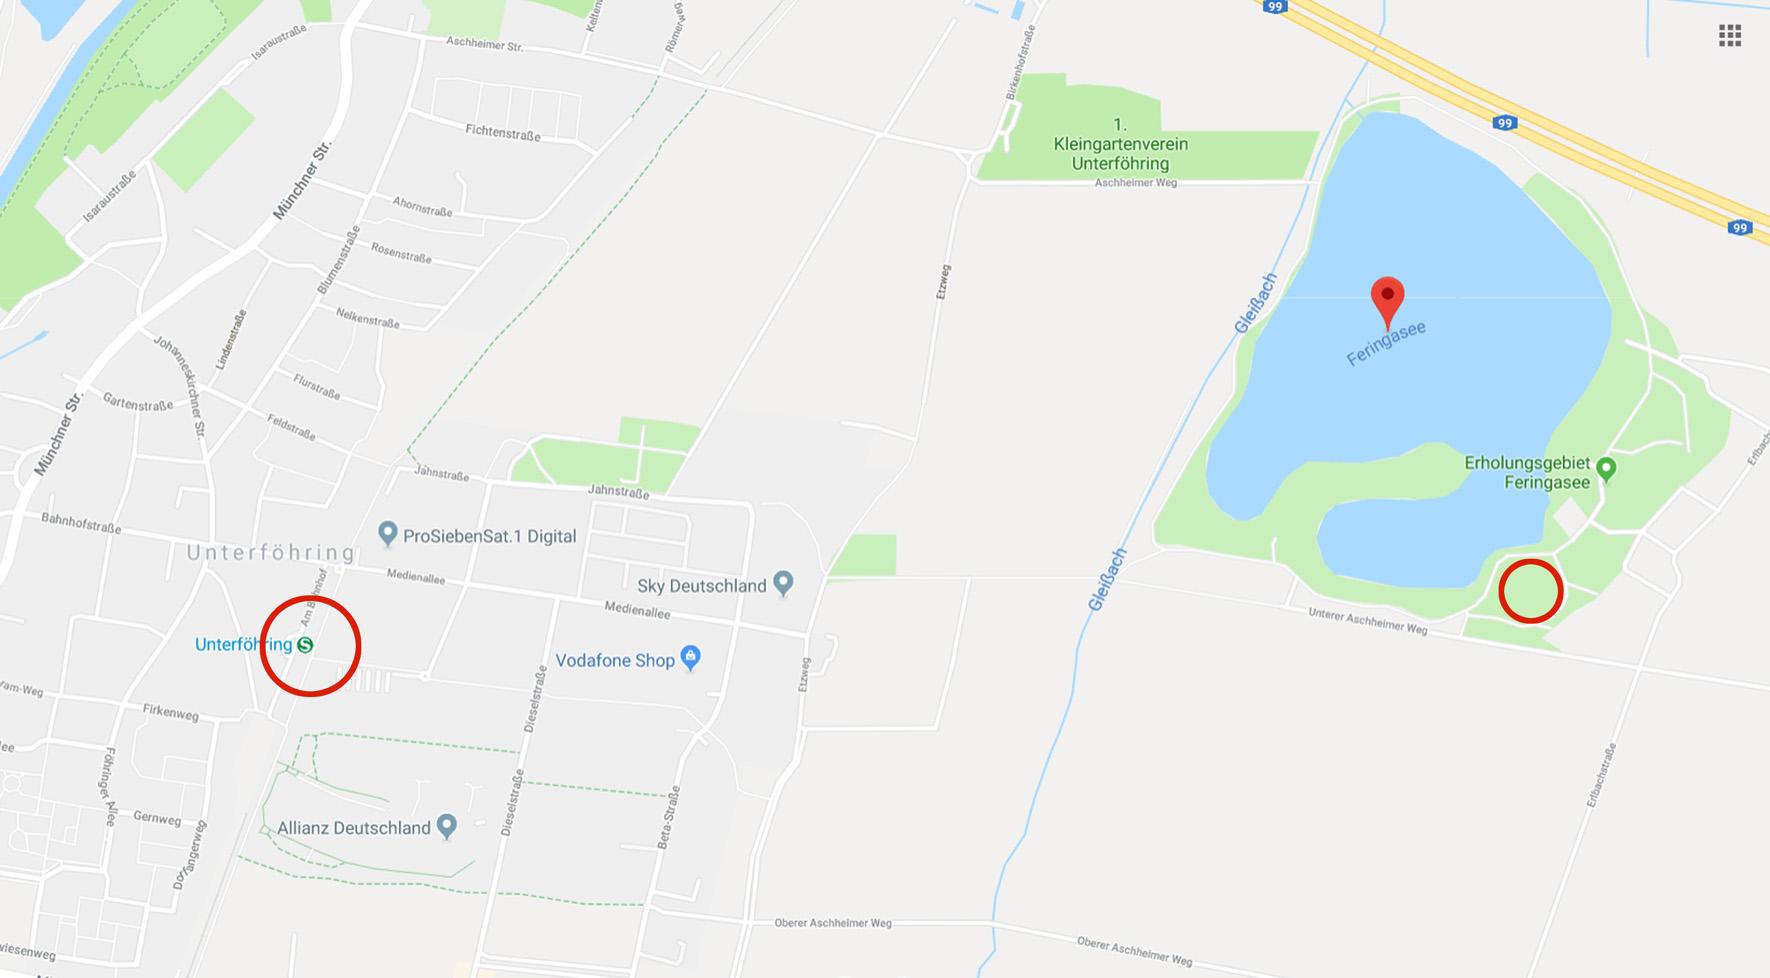 Map_Feringasee_small.jpg